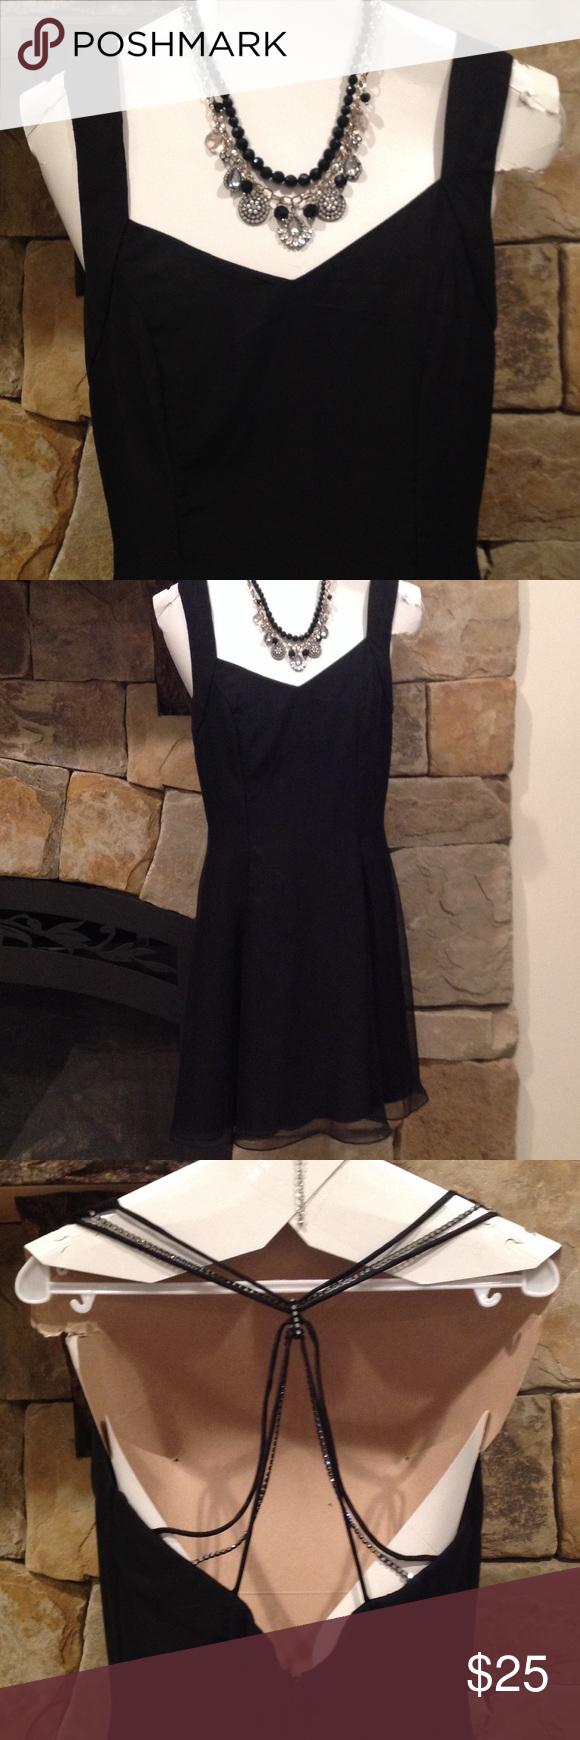 Little Black Dress Clothes Design Tank Top Fashion Fashion Design [ 1740 x 580 Pixel ]